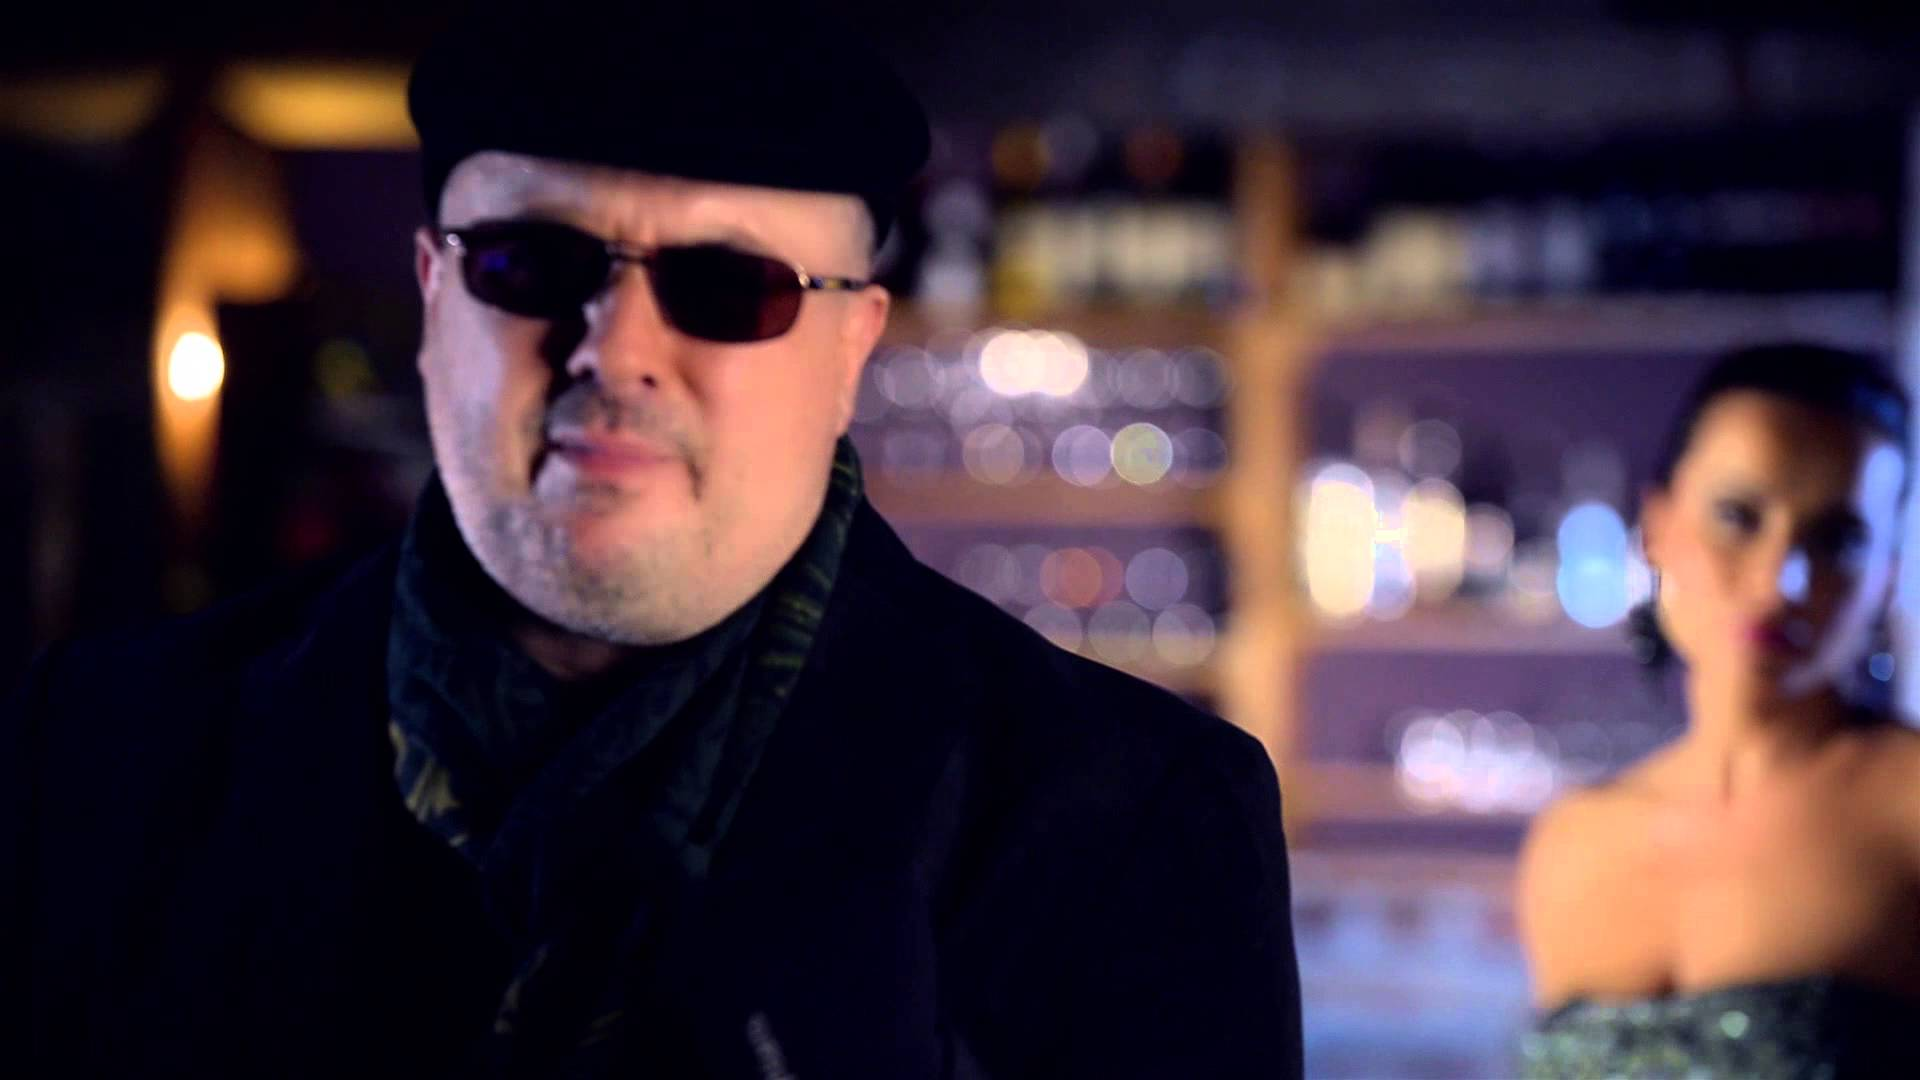 Jelena Vuckovic feat. Sinisa Vuco - 2015 - Do Smrti Zajedno